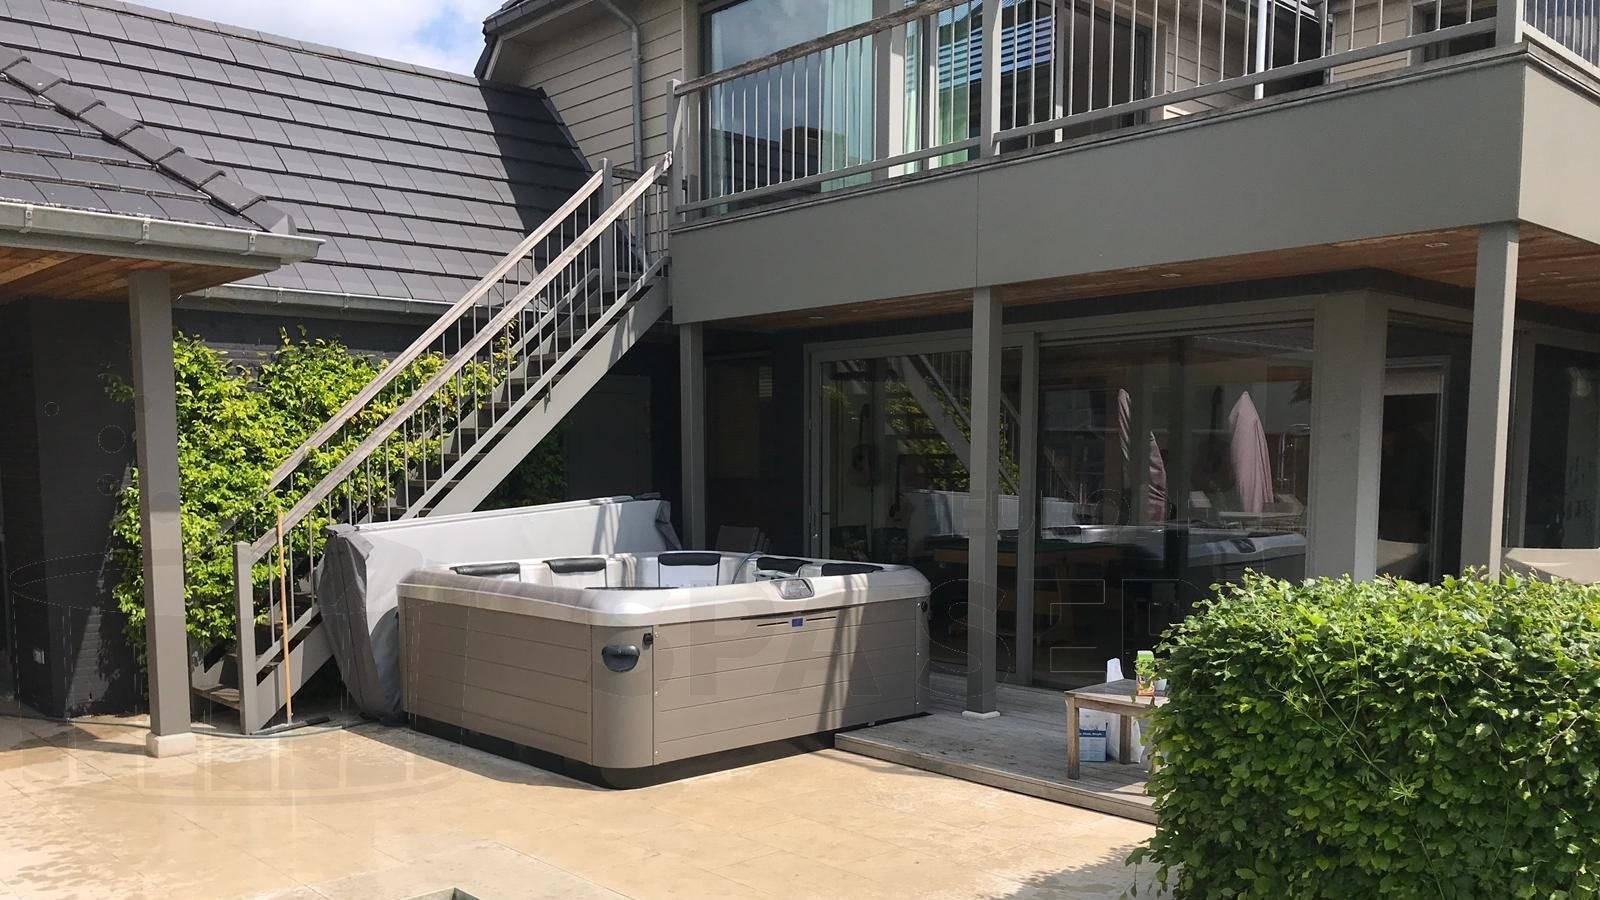 Plaatsing van een Villeroy & Boch A8D spa in Boechout België